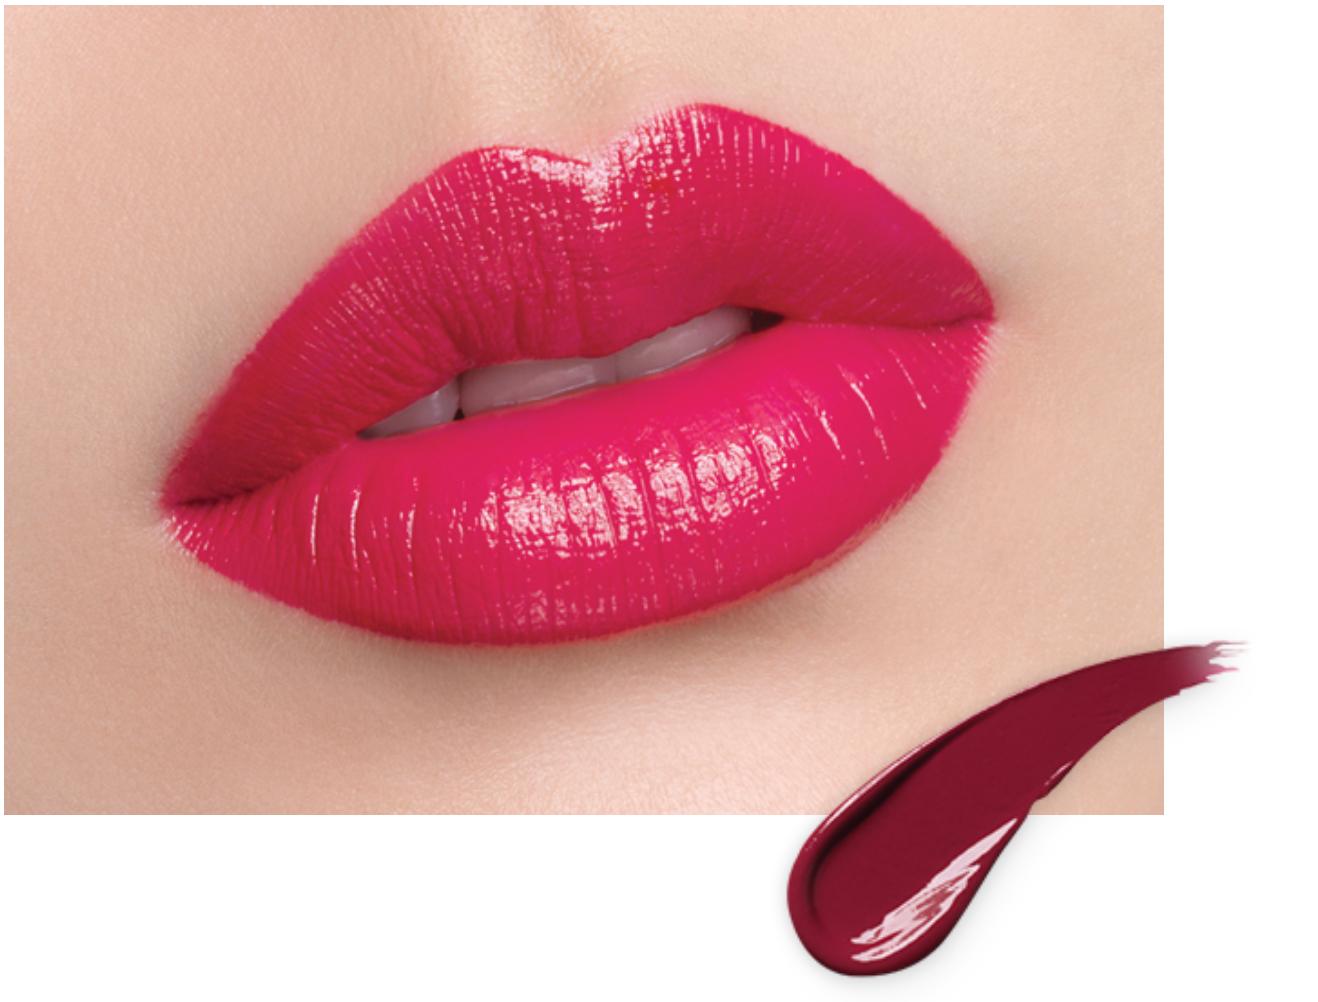 laneige-silk-intense-lipstick-325.png